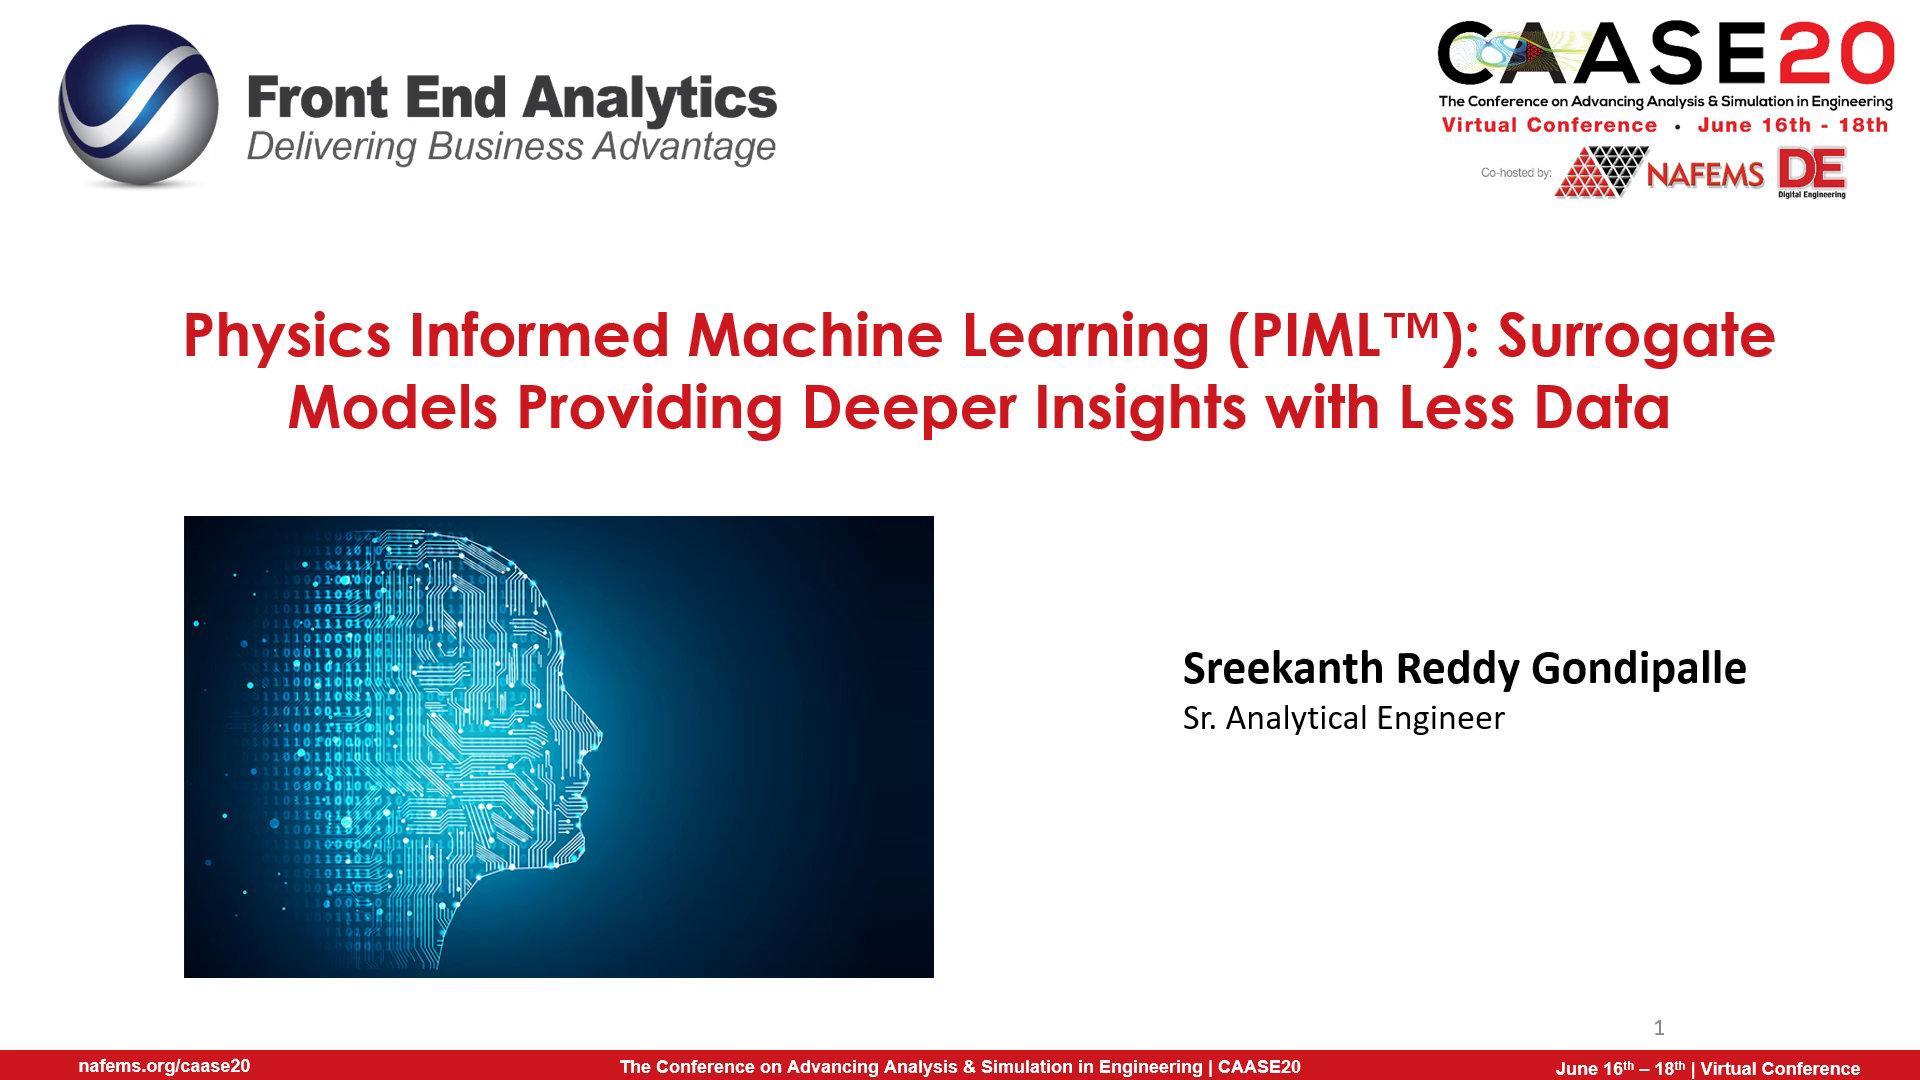 Physics Informed Machine Learning PIML Surrogate Models